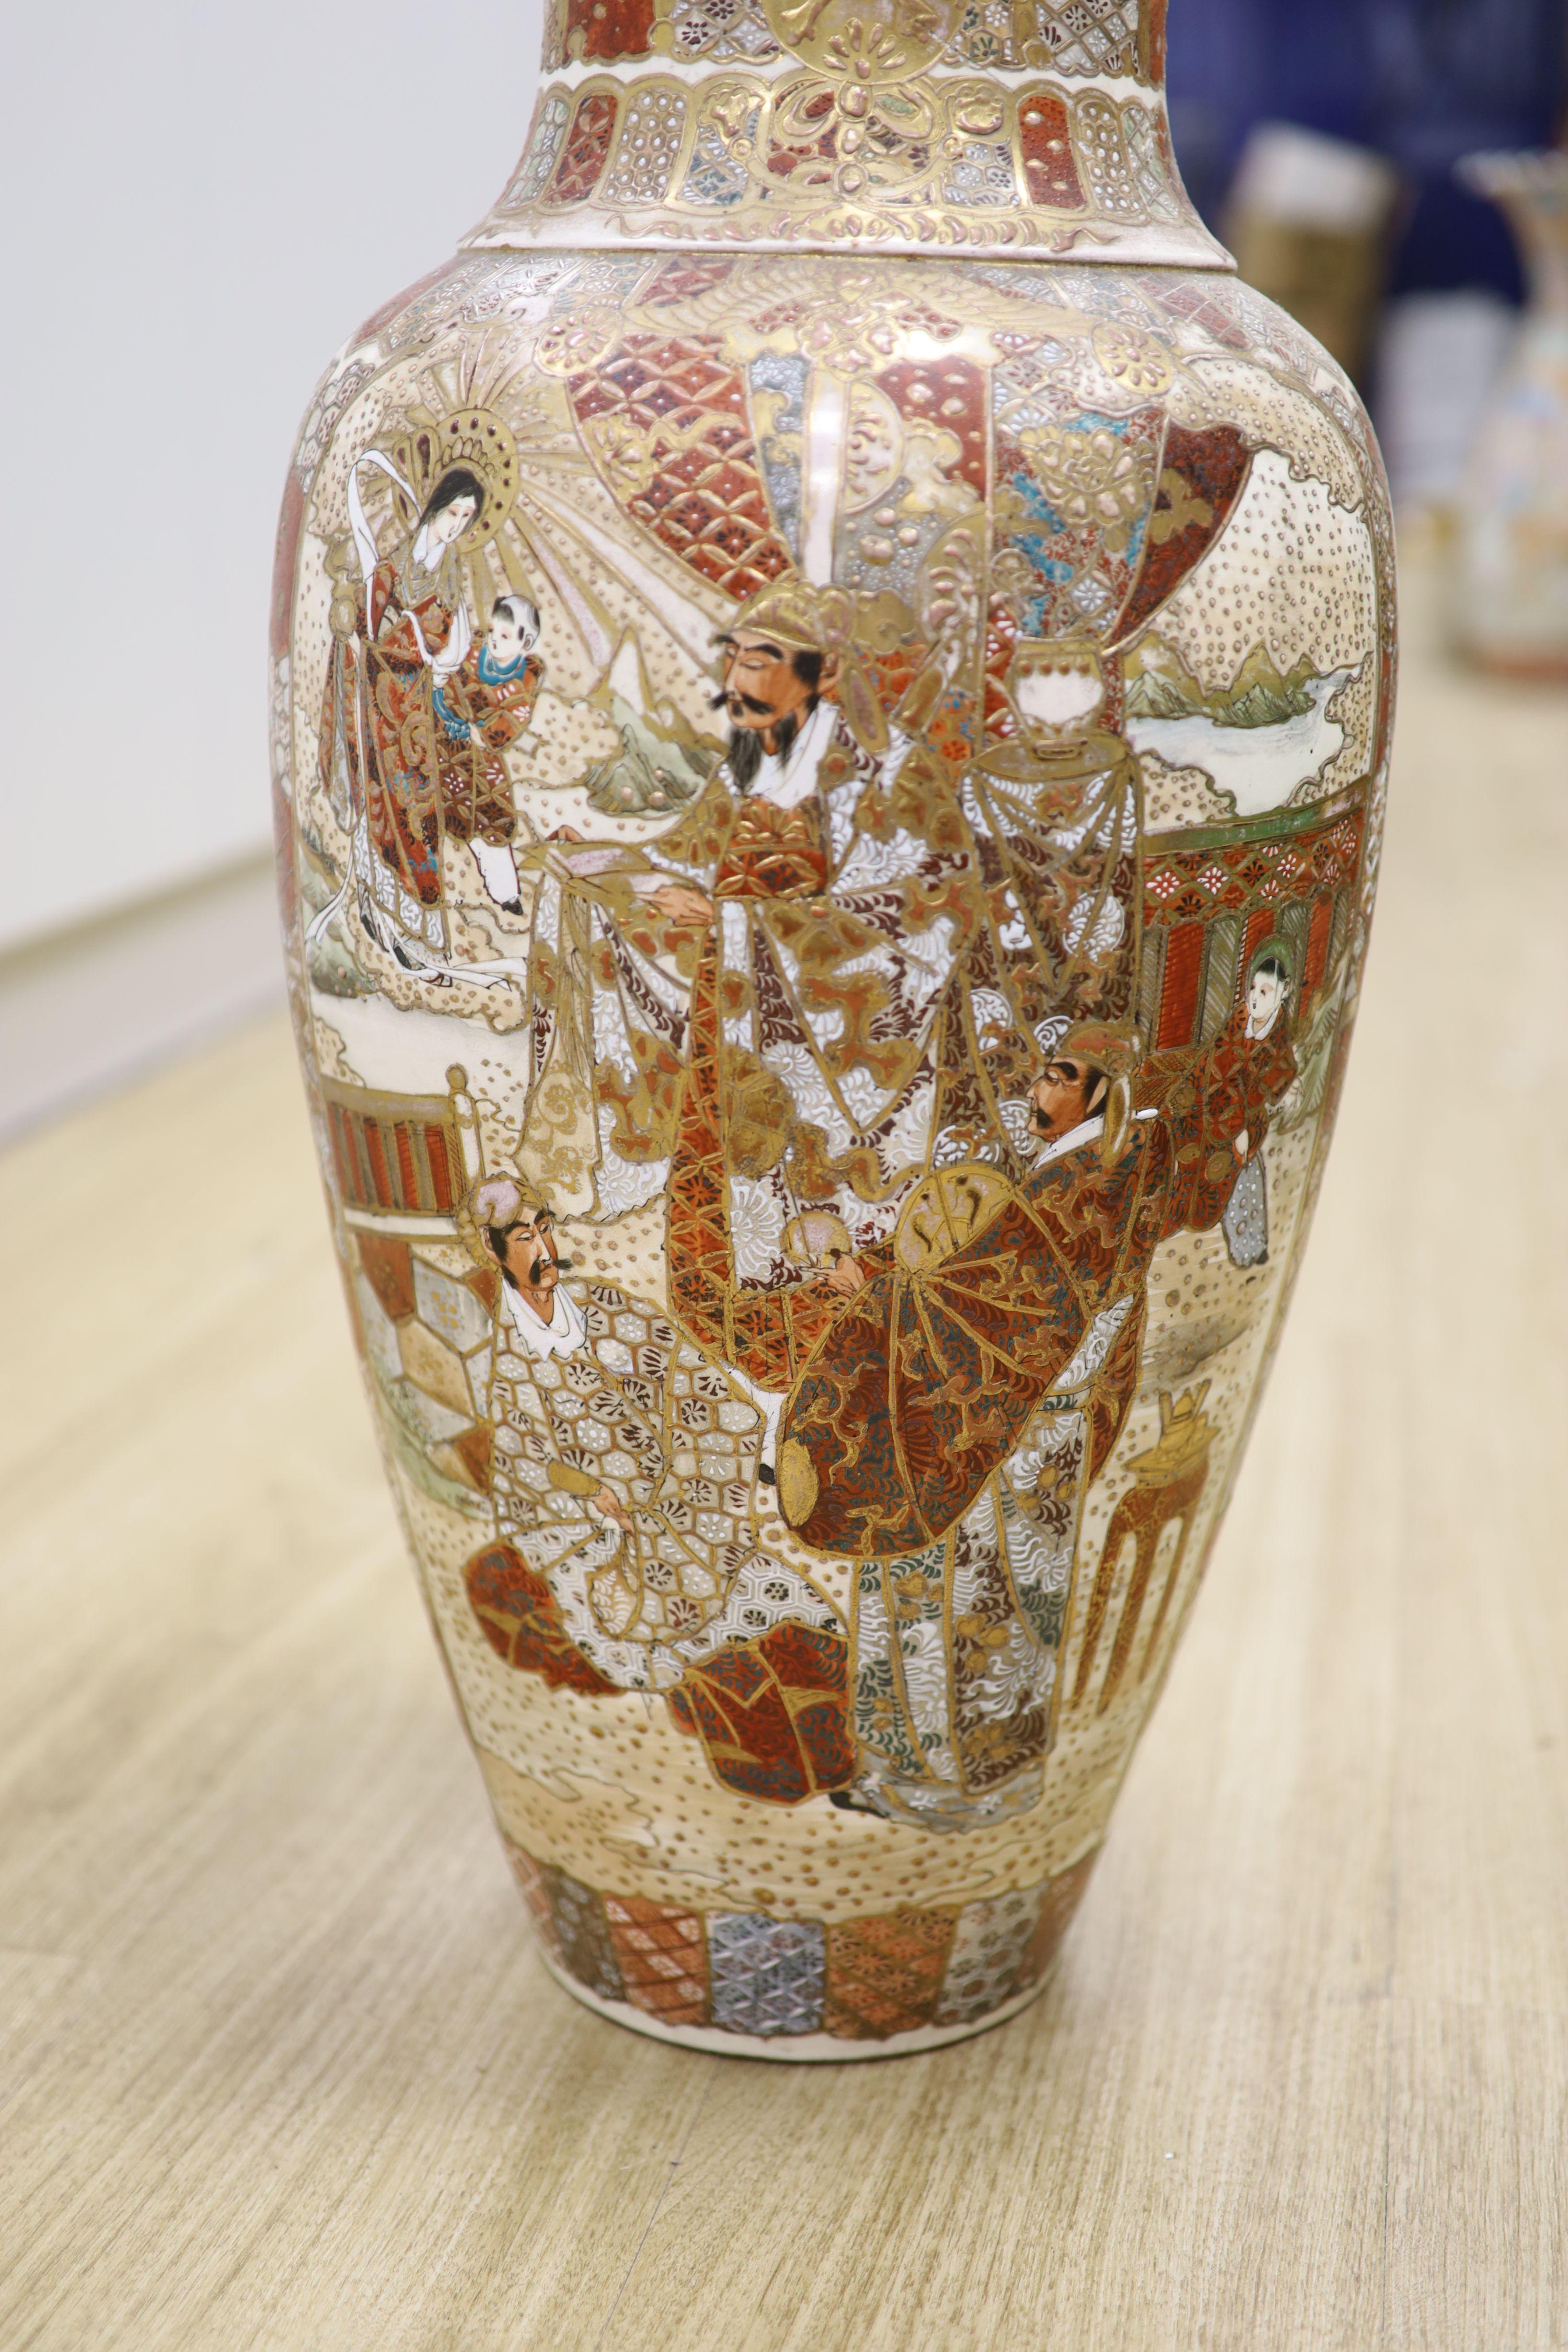 A large Satsuma pottery vase, height 63cm - Image 5 of 8